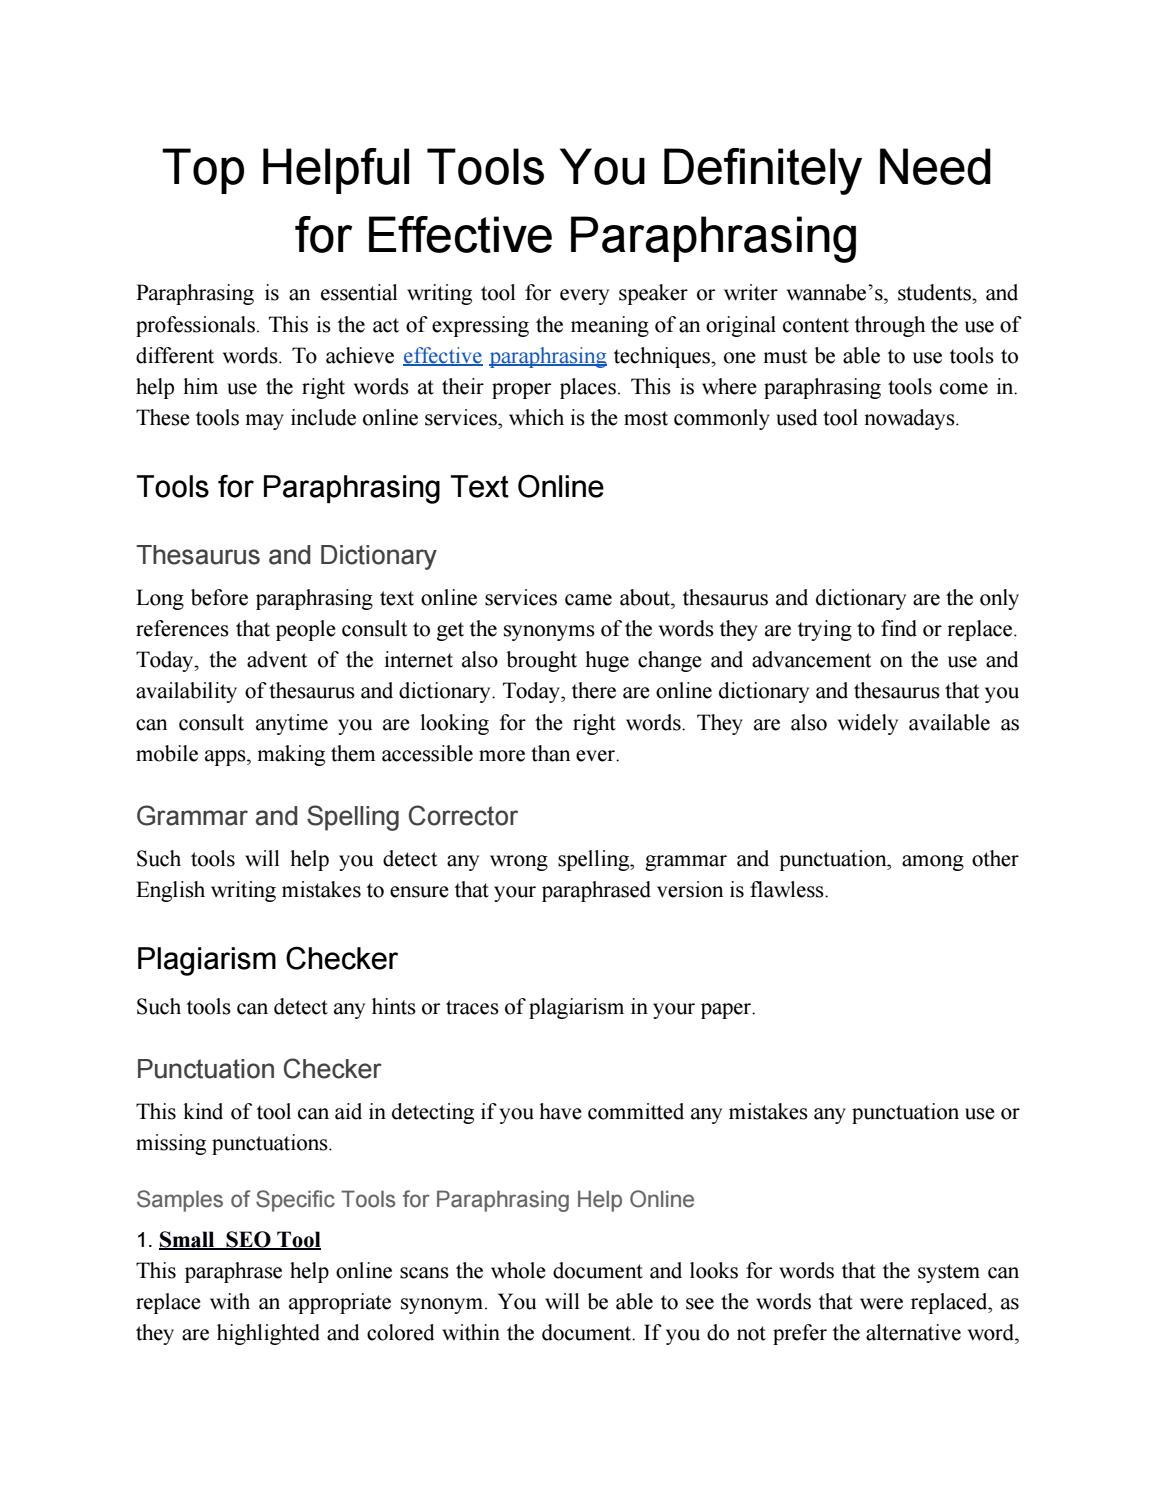 paraphrase online service by Online Services - issuu